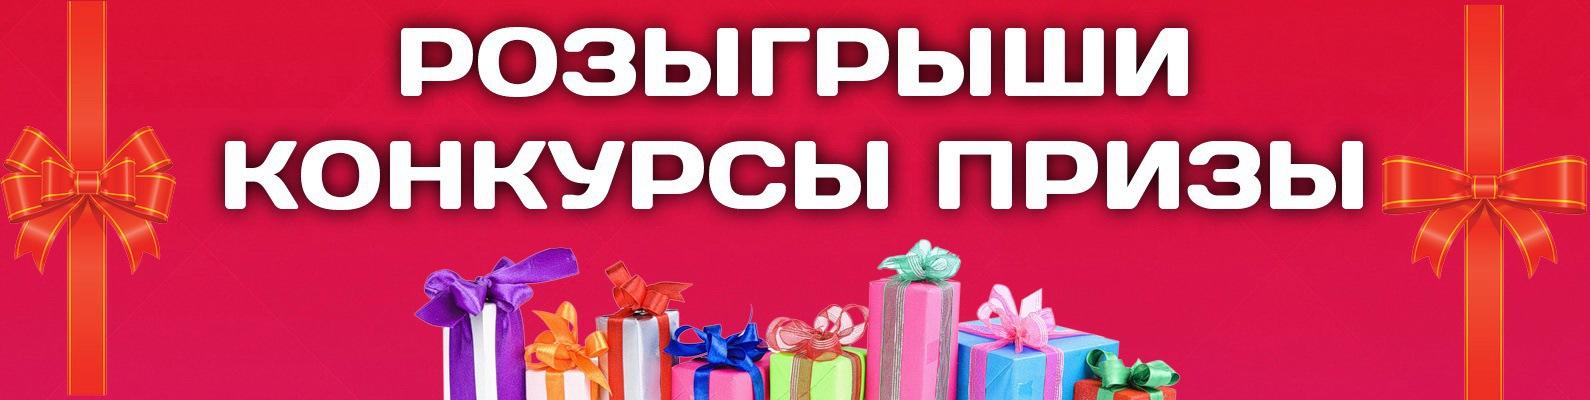 Конкурсы на подарки фото 239